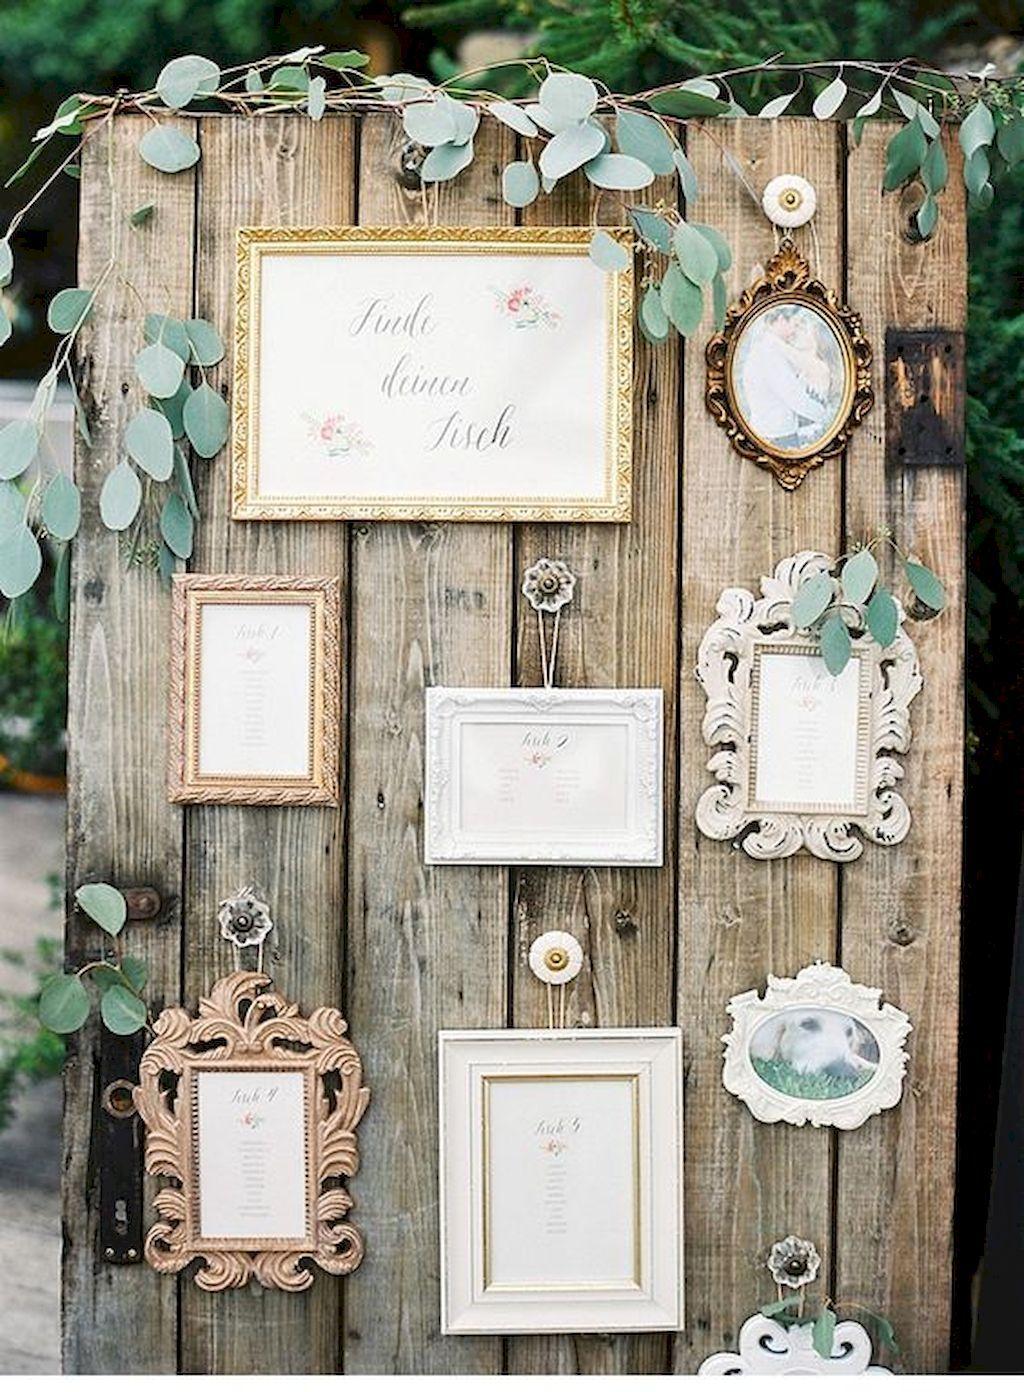 81 Elegant Outdoor Vineyard Wedding Decorations Ideas | Vineyard ...